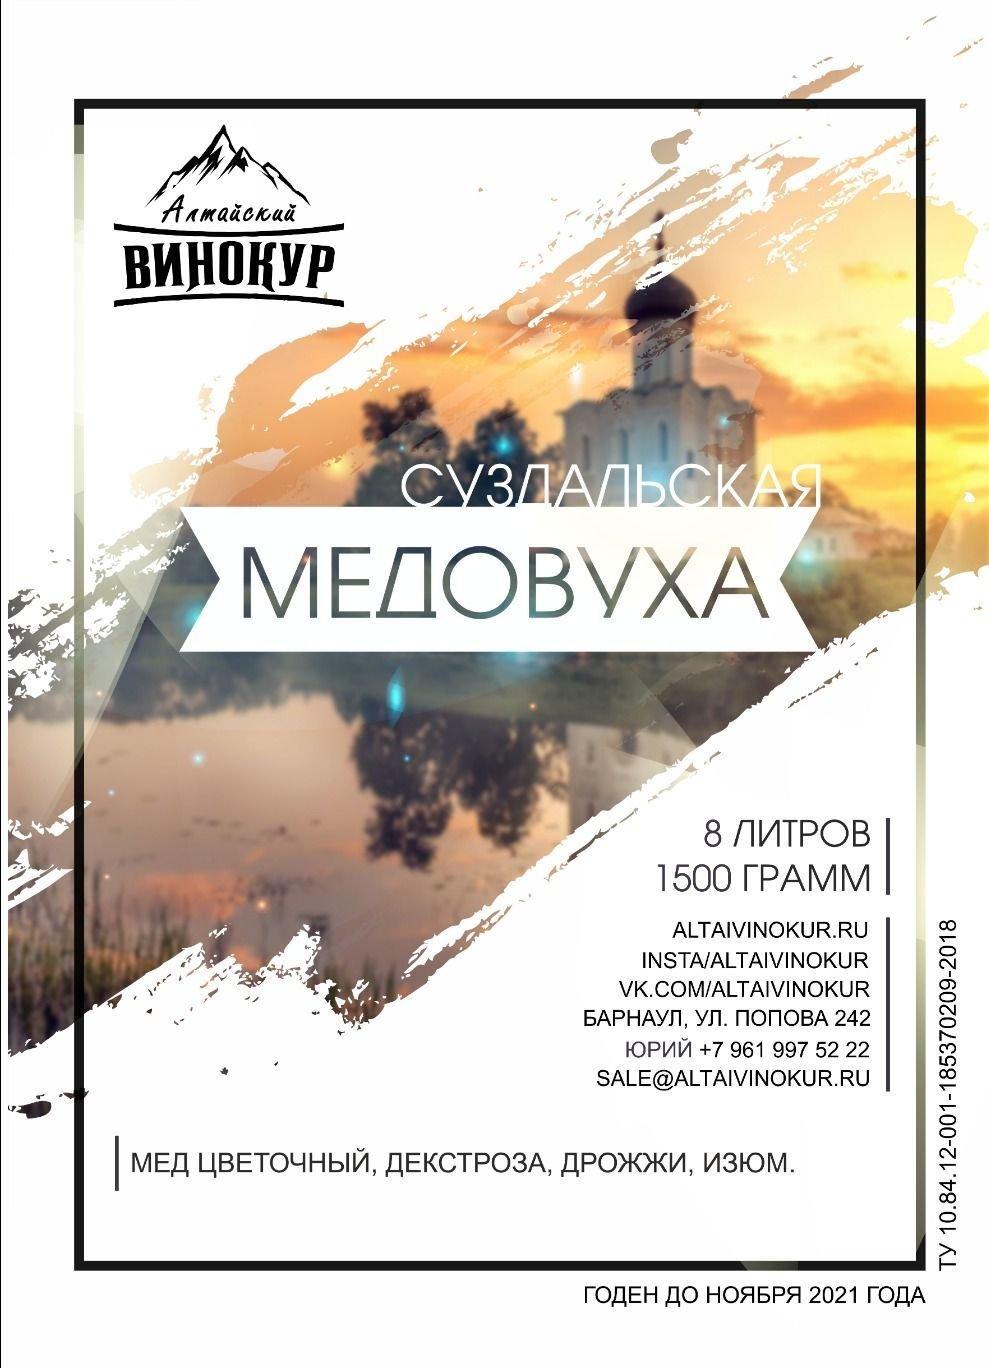 Медовуха Суздальская